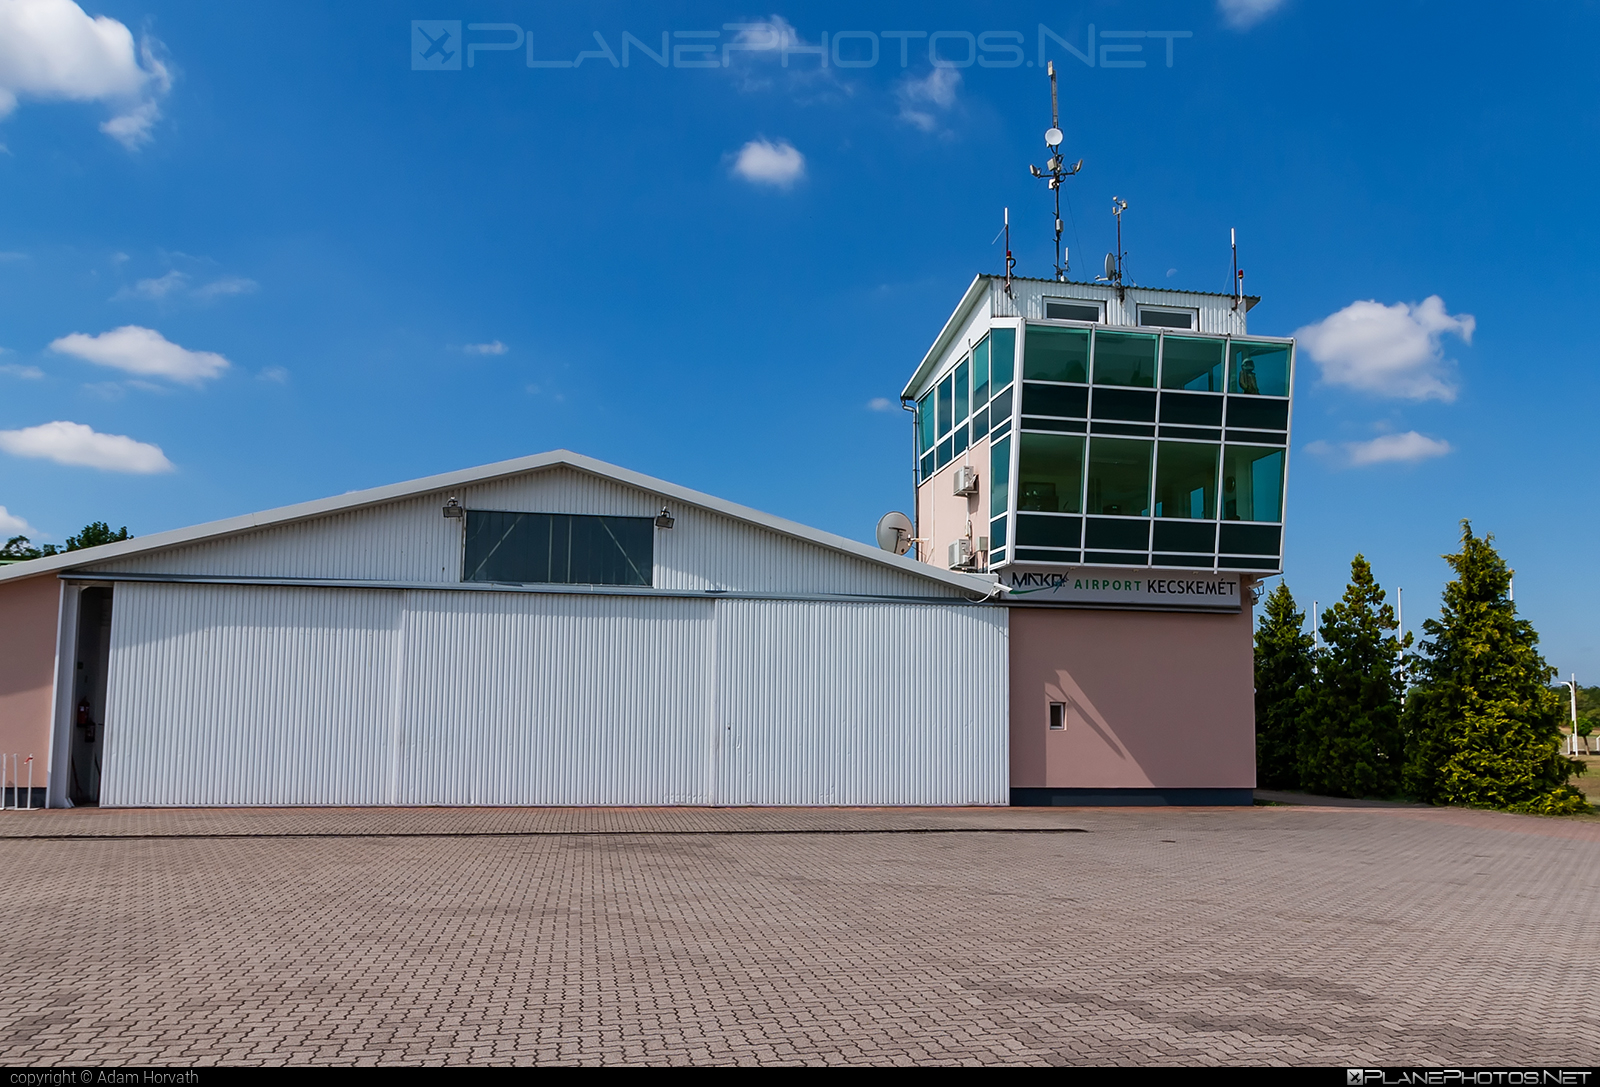 Matkópuszta airport overview #matkopusztaairport